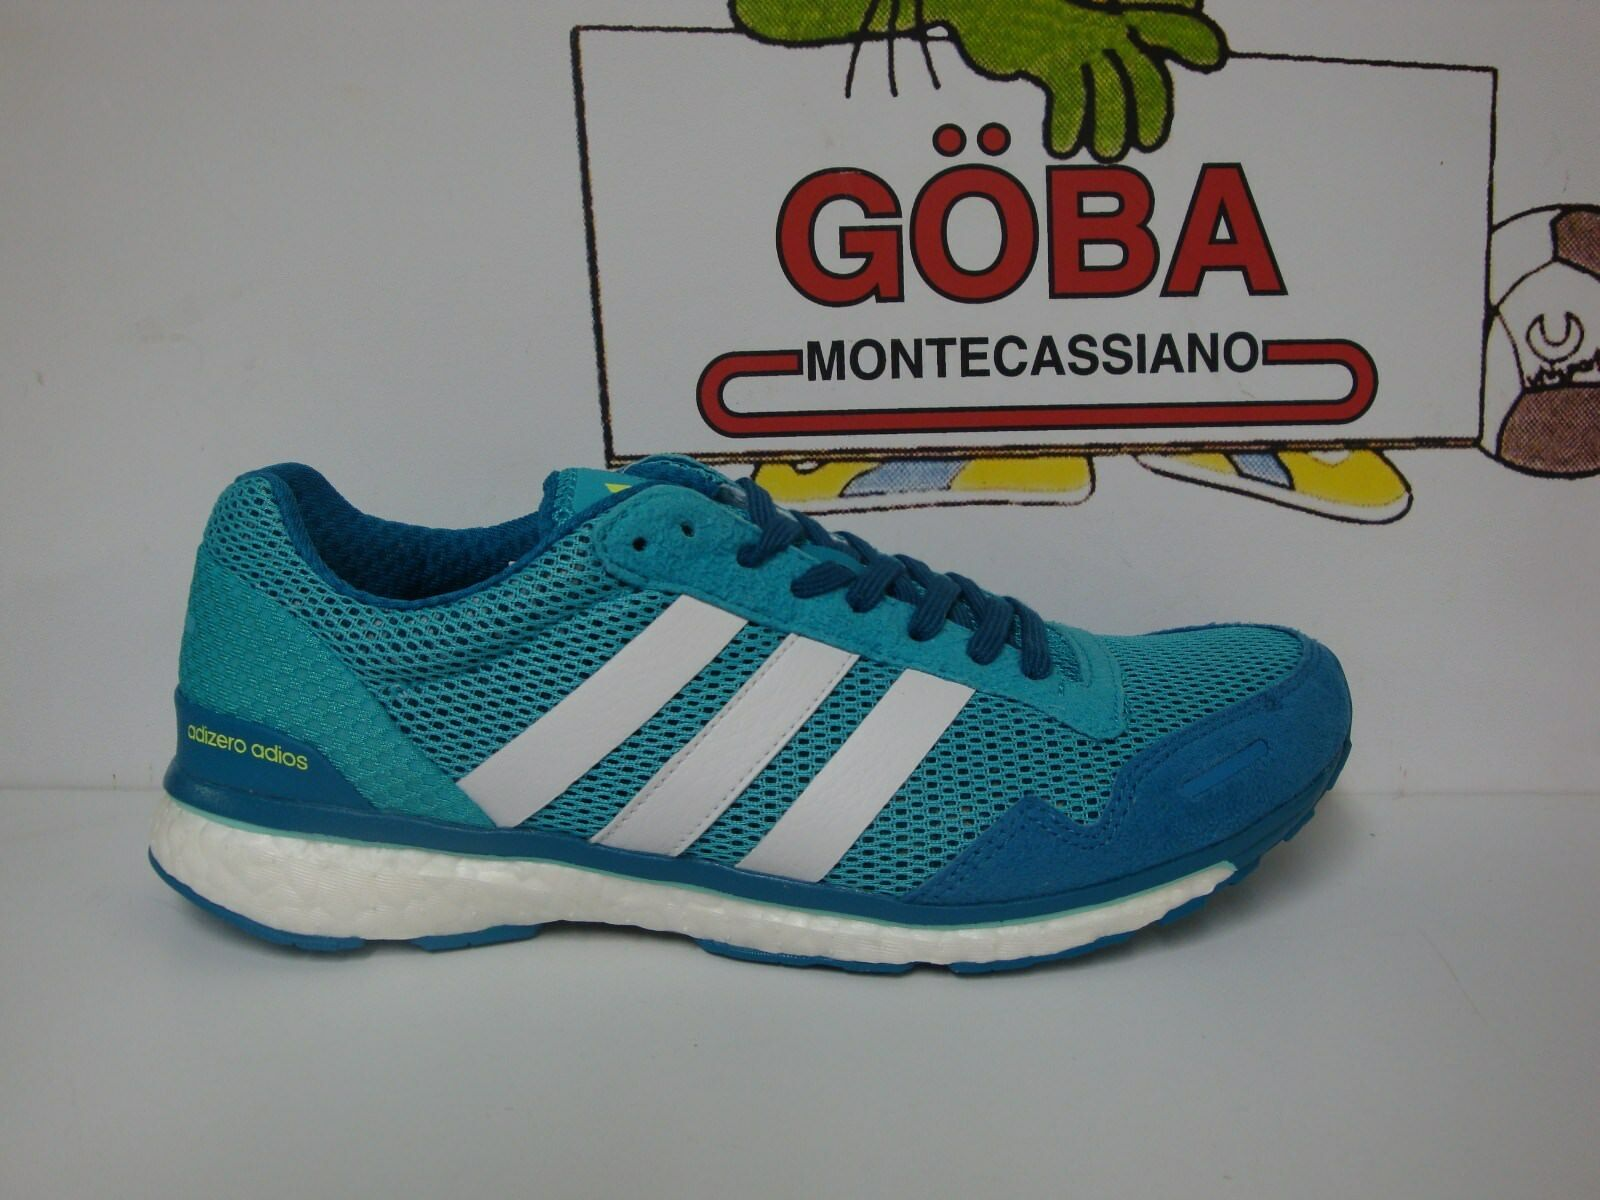 ADIDAS ADIZERO CG3043 M BOOST ADIOS 4921chdvk82044 Sneaker